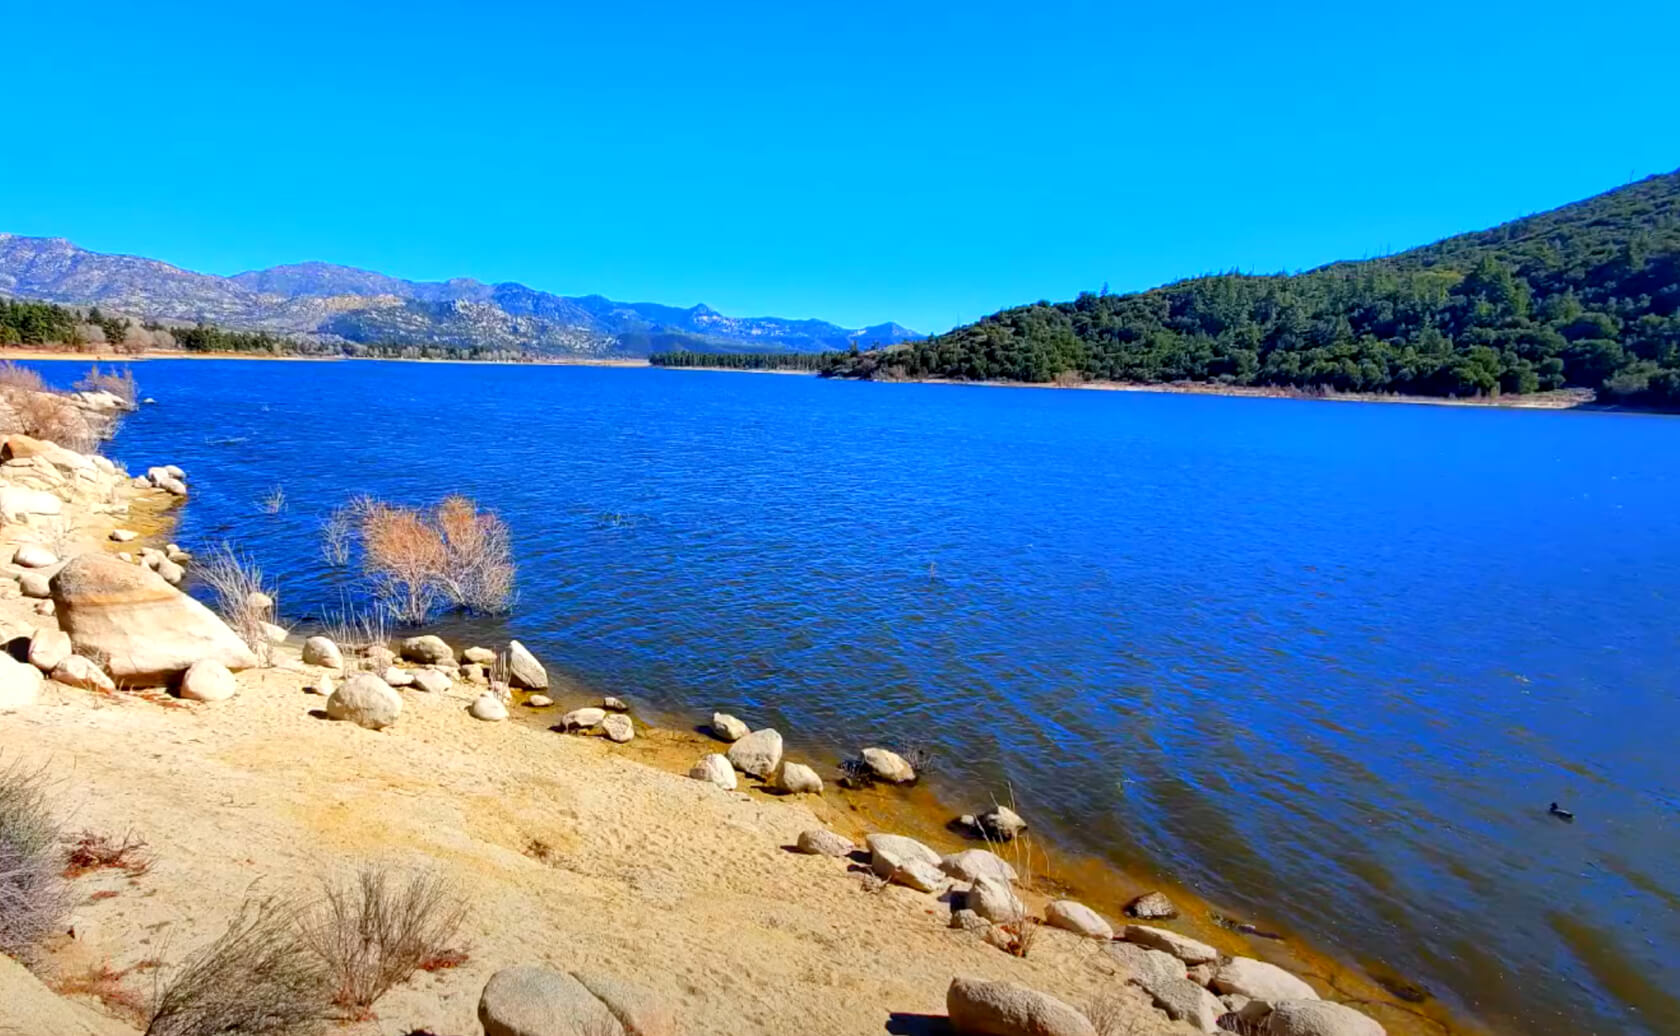 Hemet-Lake-Fishing-Guide-Report-Idyllwild-CA-03